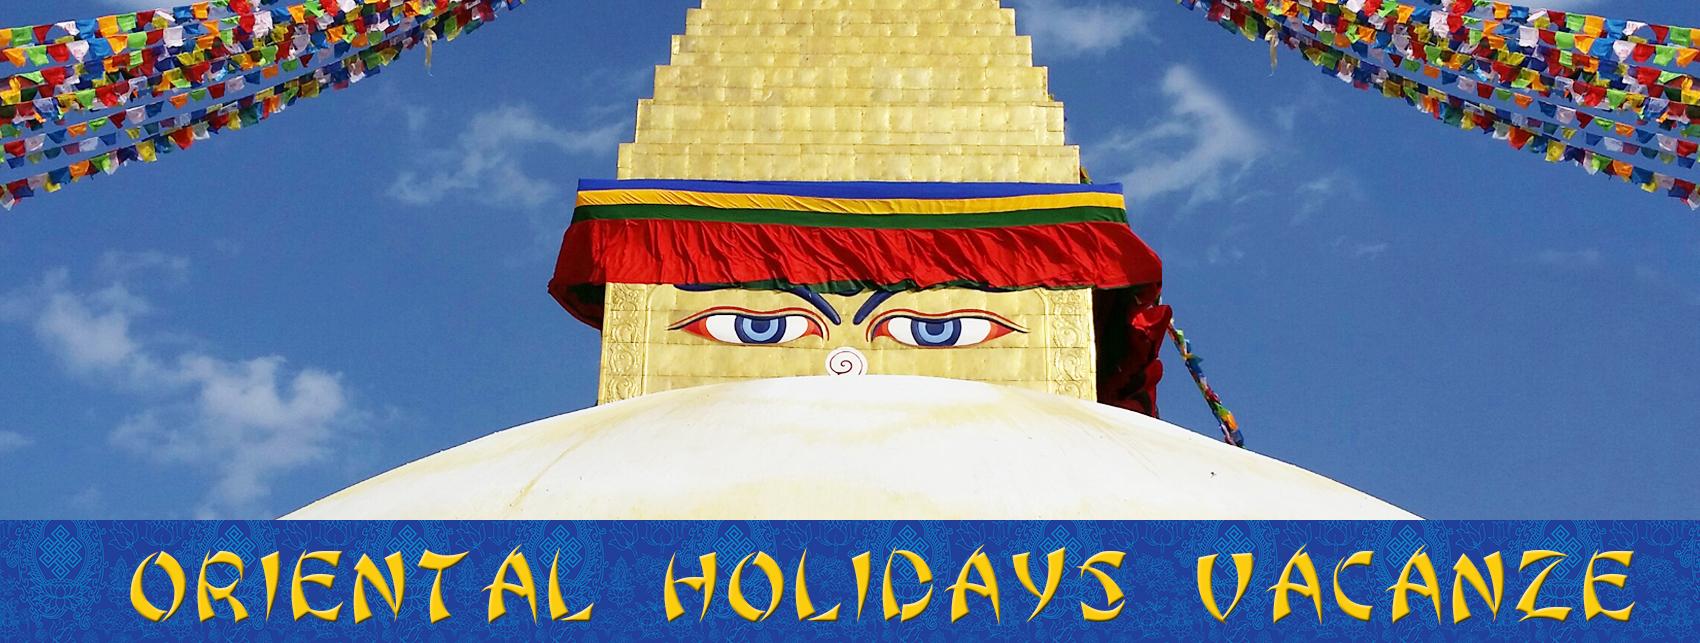 Oriental Holidays Vacanza